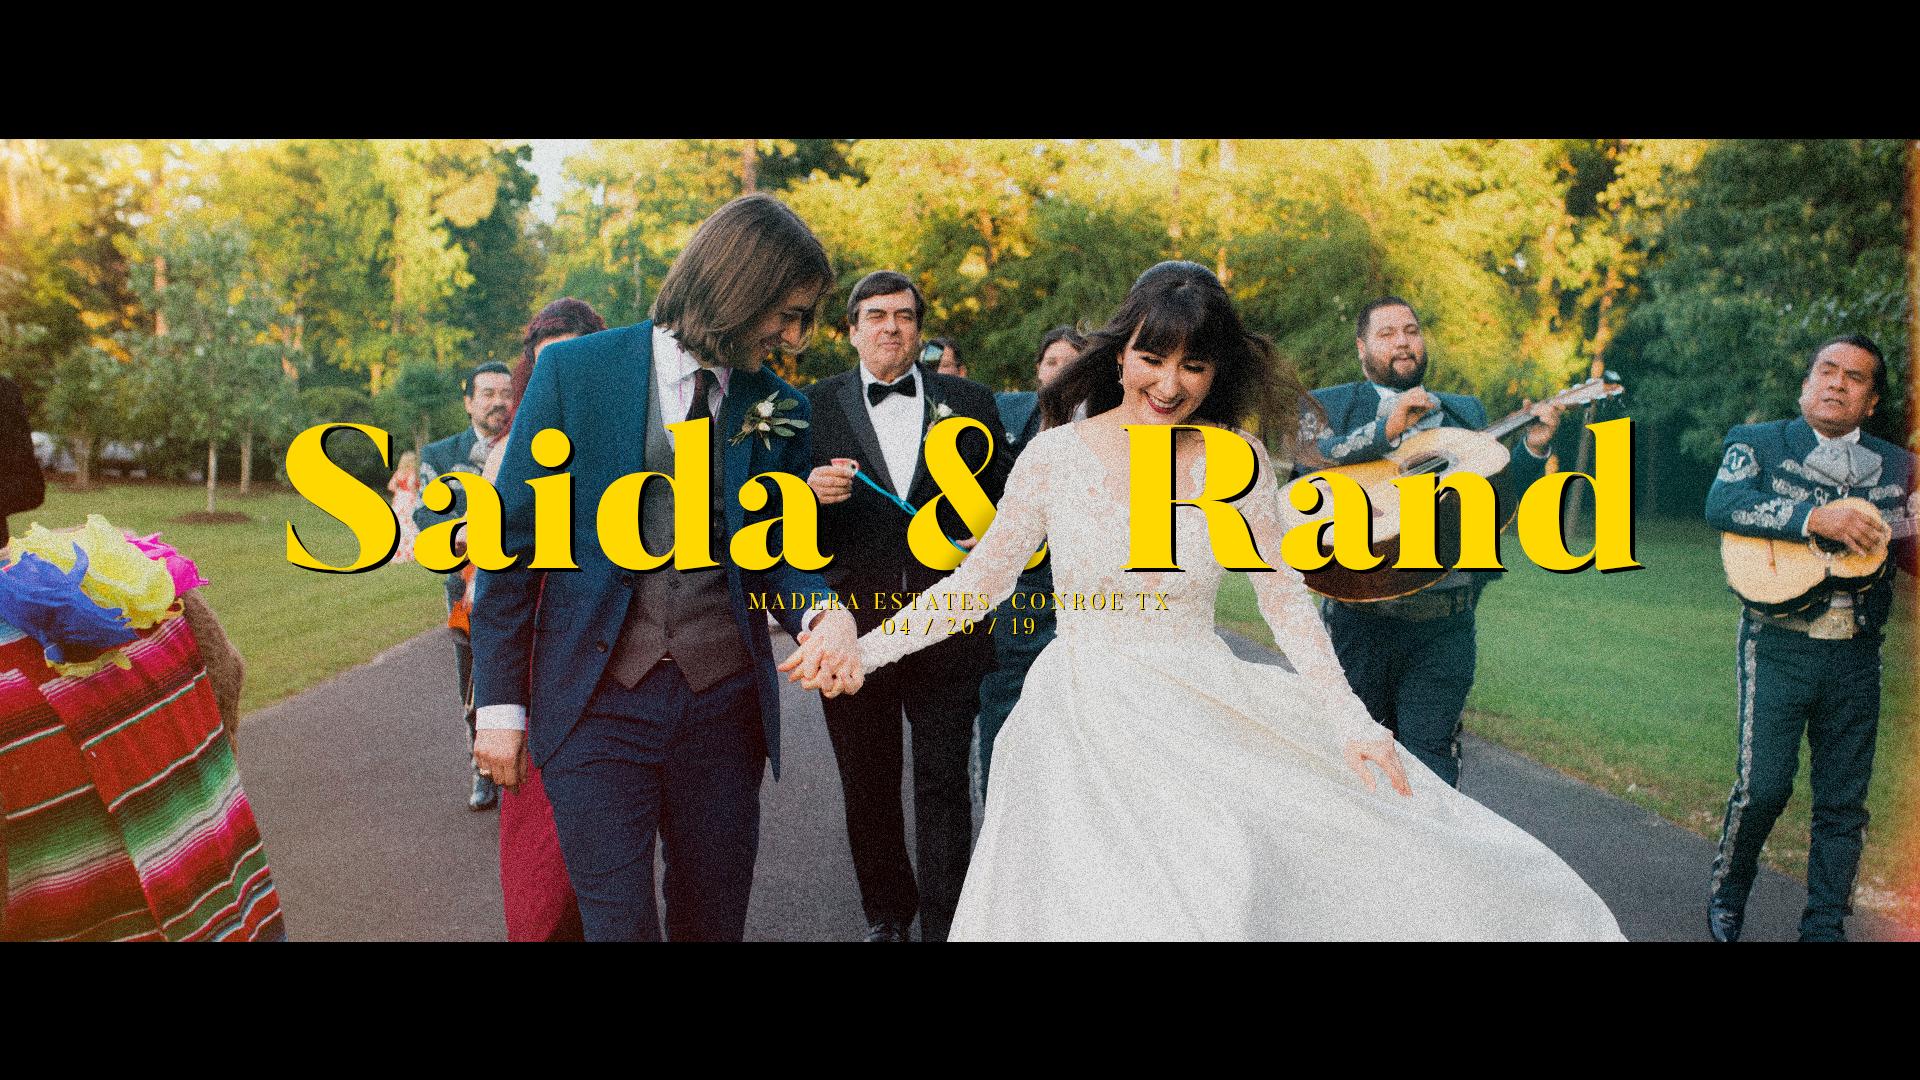 Saida + Rand | Conroe, Texas | Madera Estates Wedding and Events